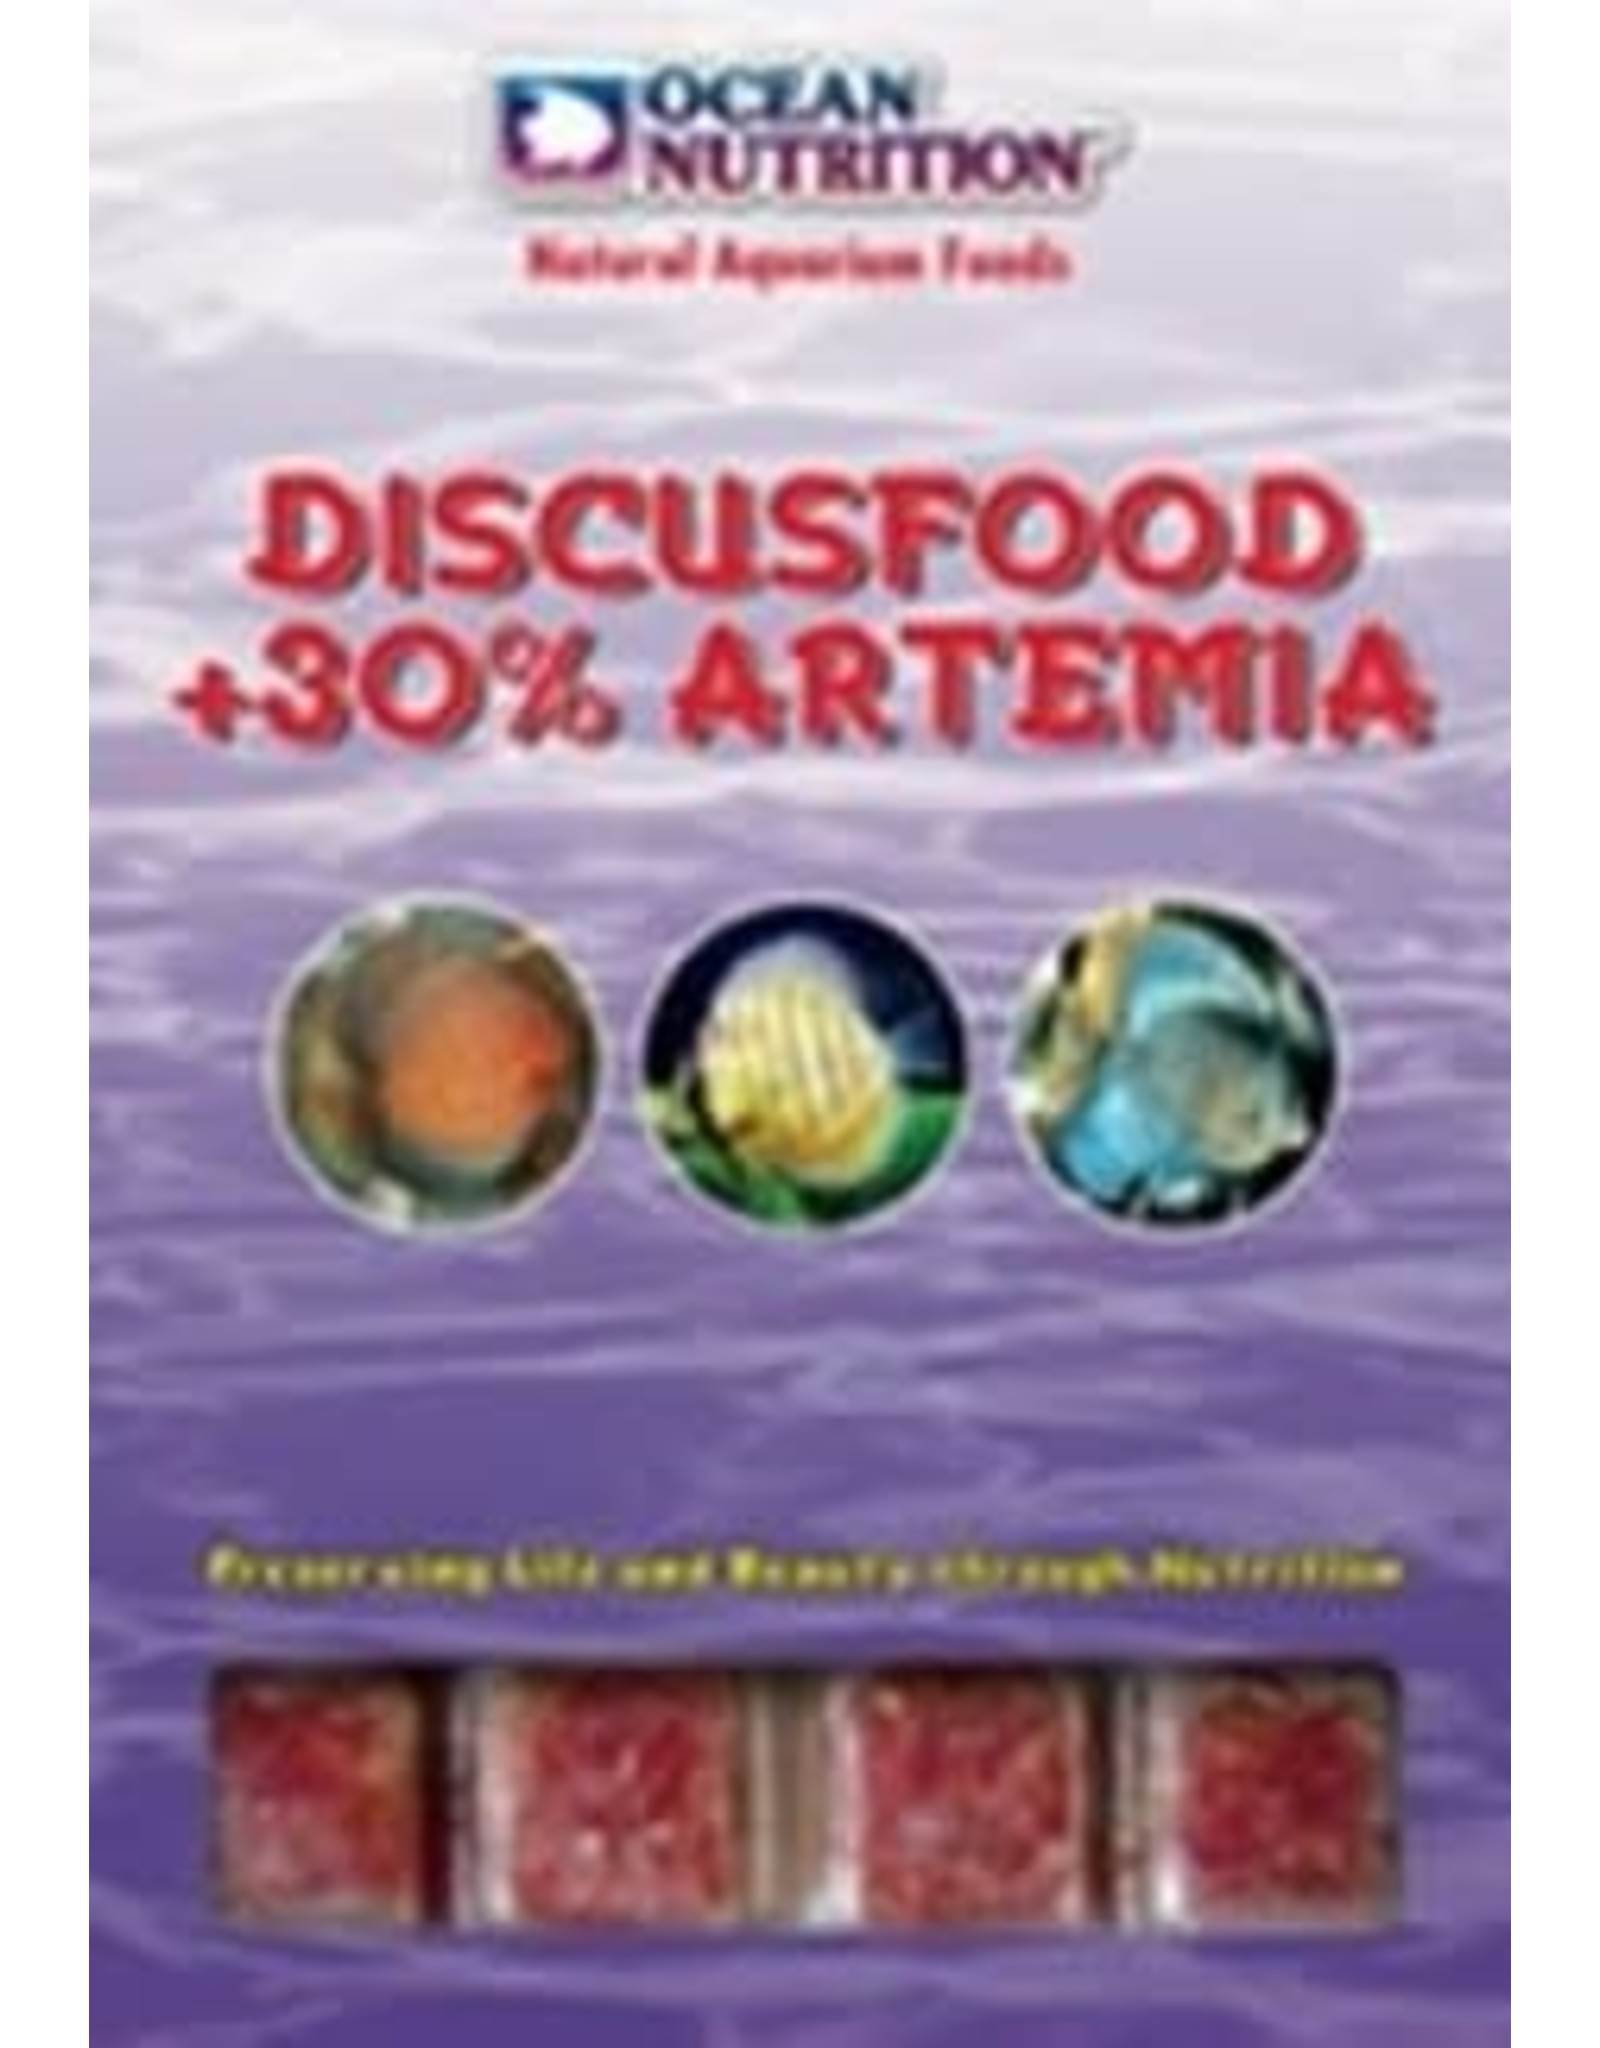 Ocean Nutrition discusvoer + 30% artemia 100gr